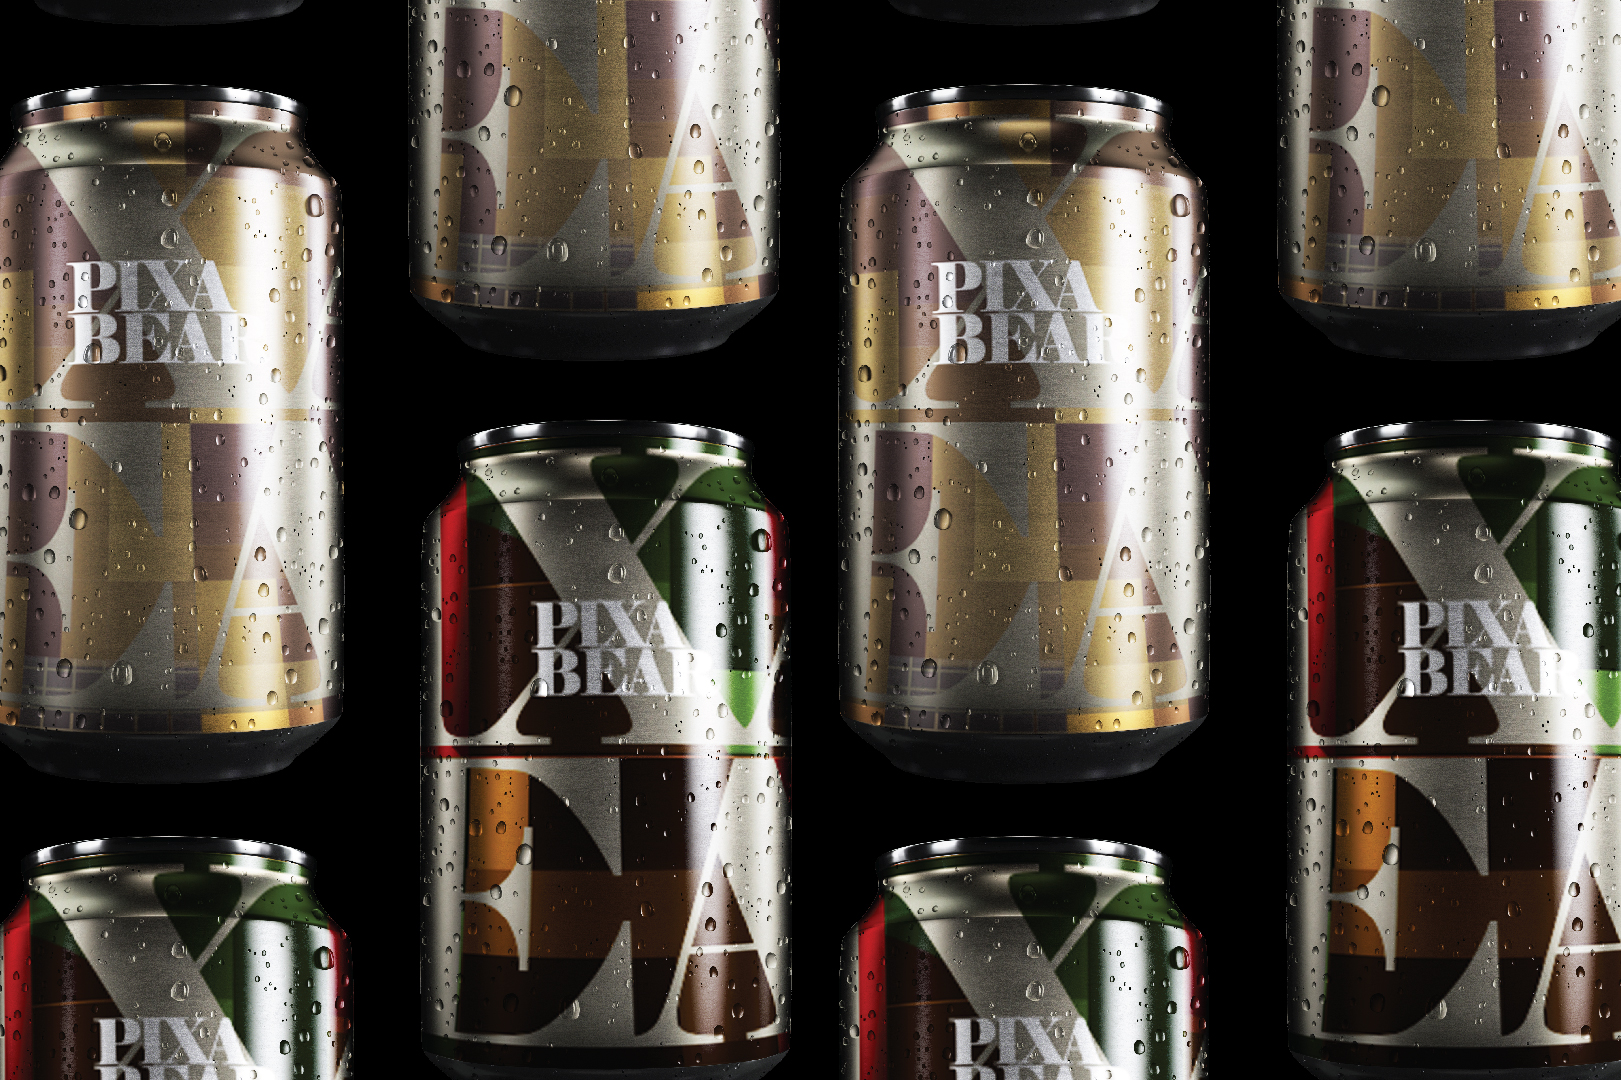 PIXA Bear. Yes, its bear not beer